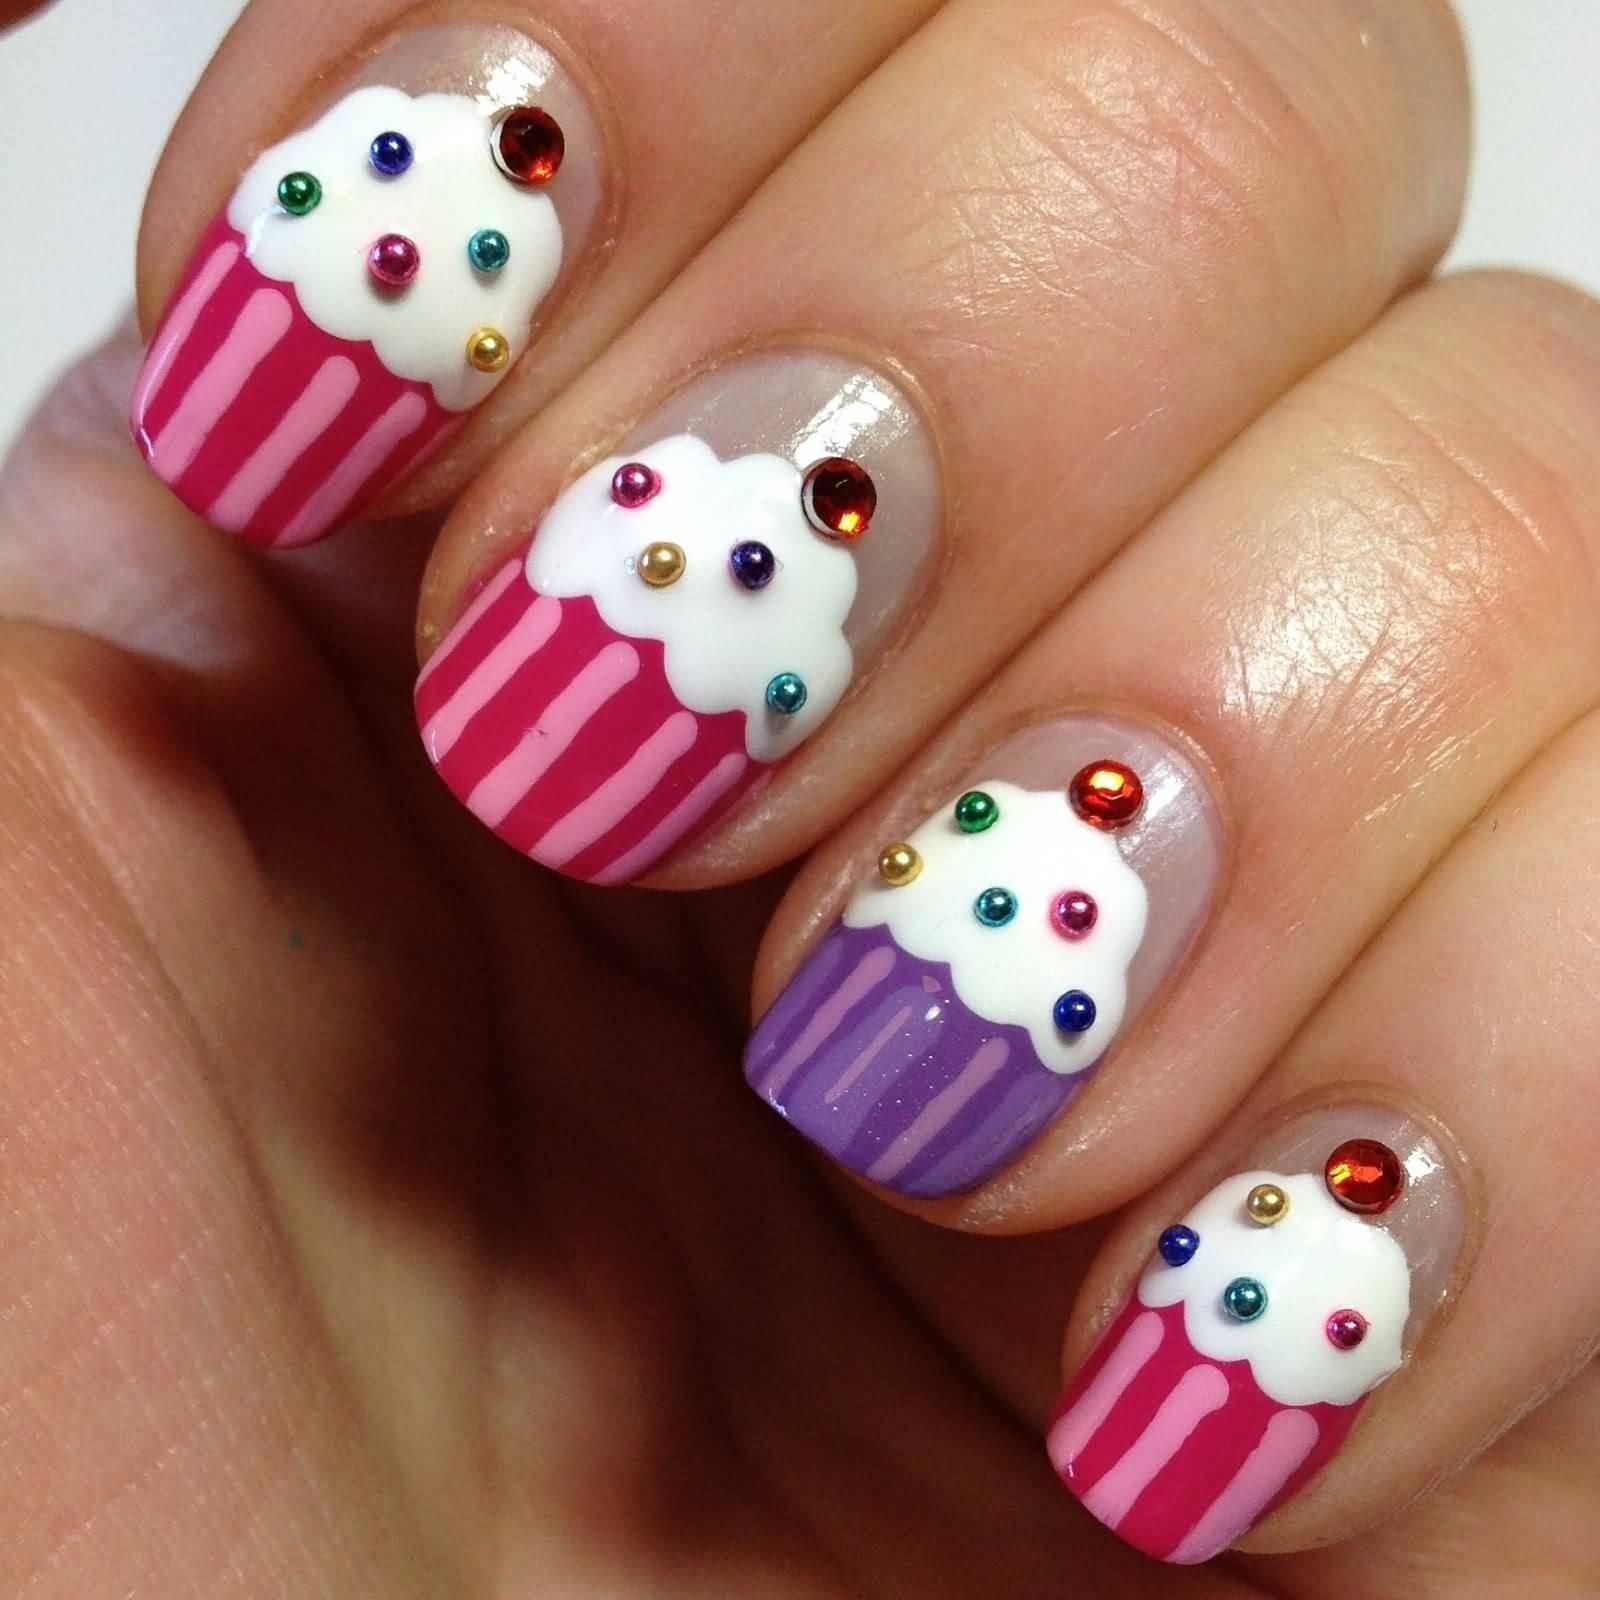 Cupcake Nail Art With Rhinestones Design